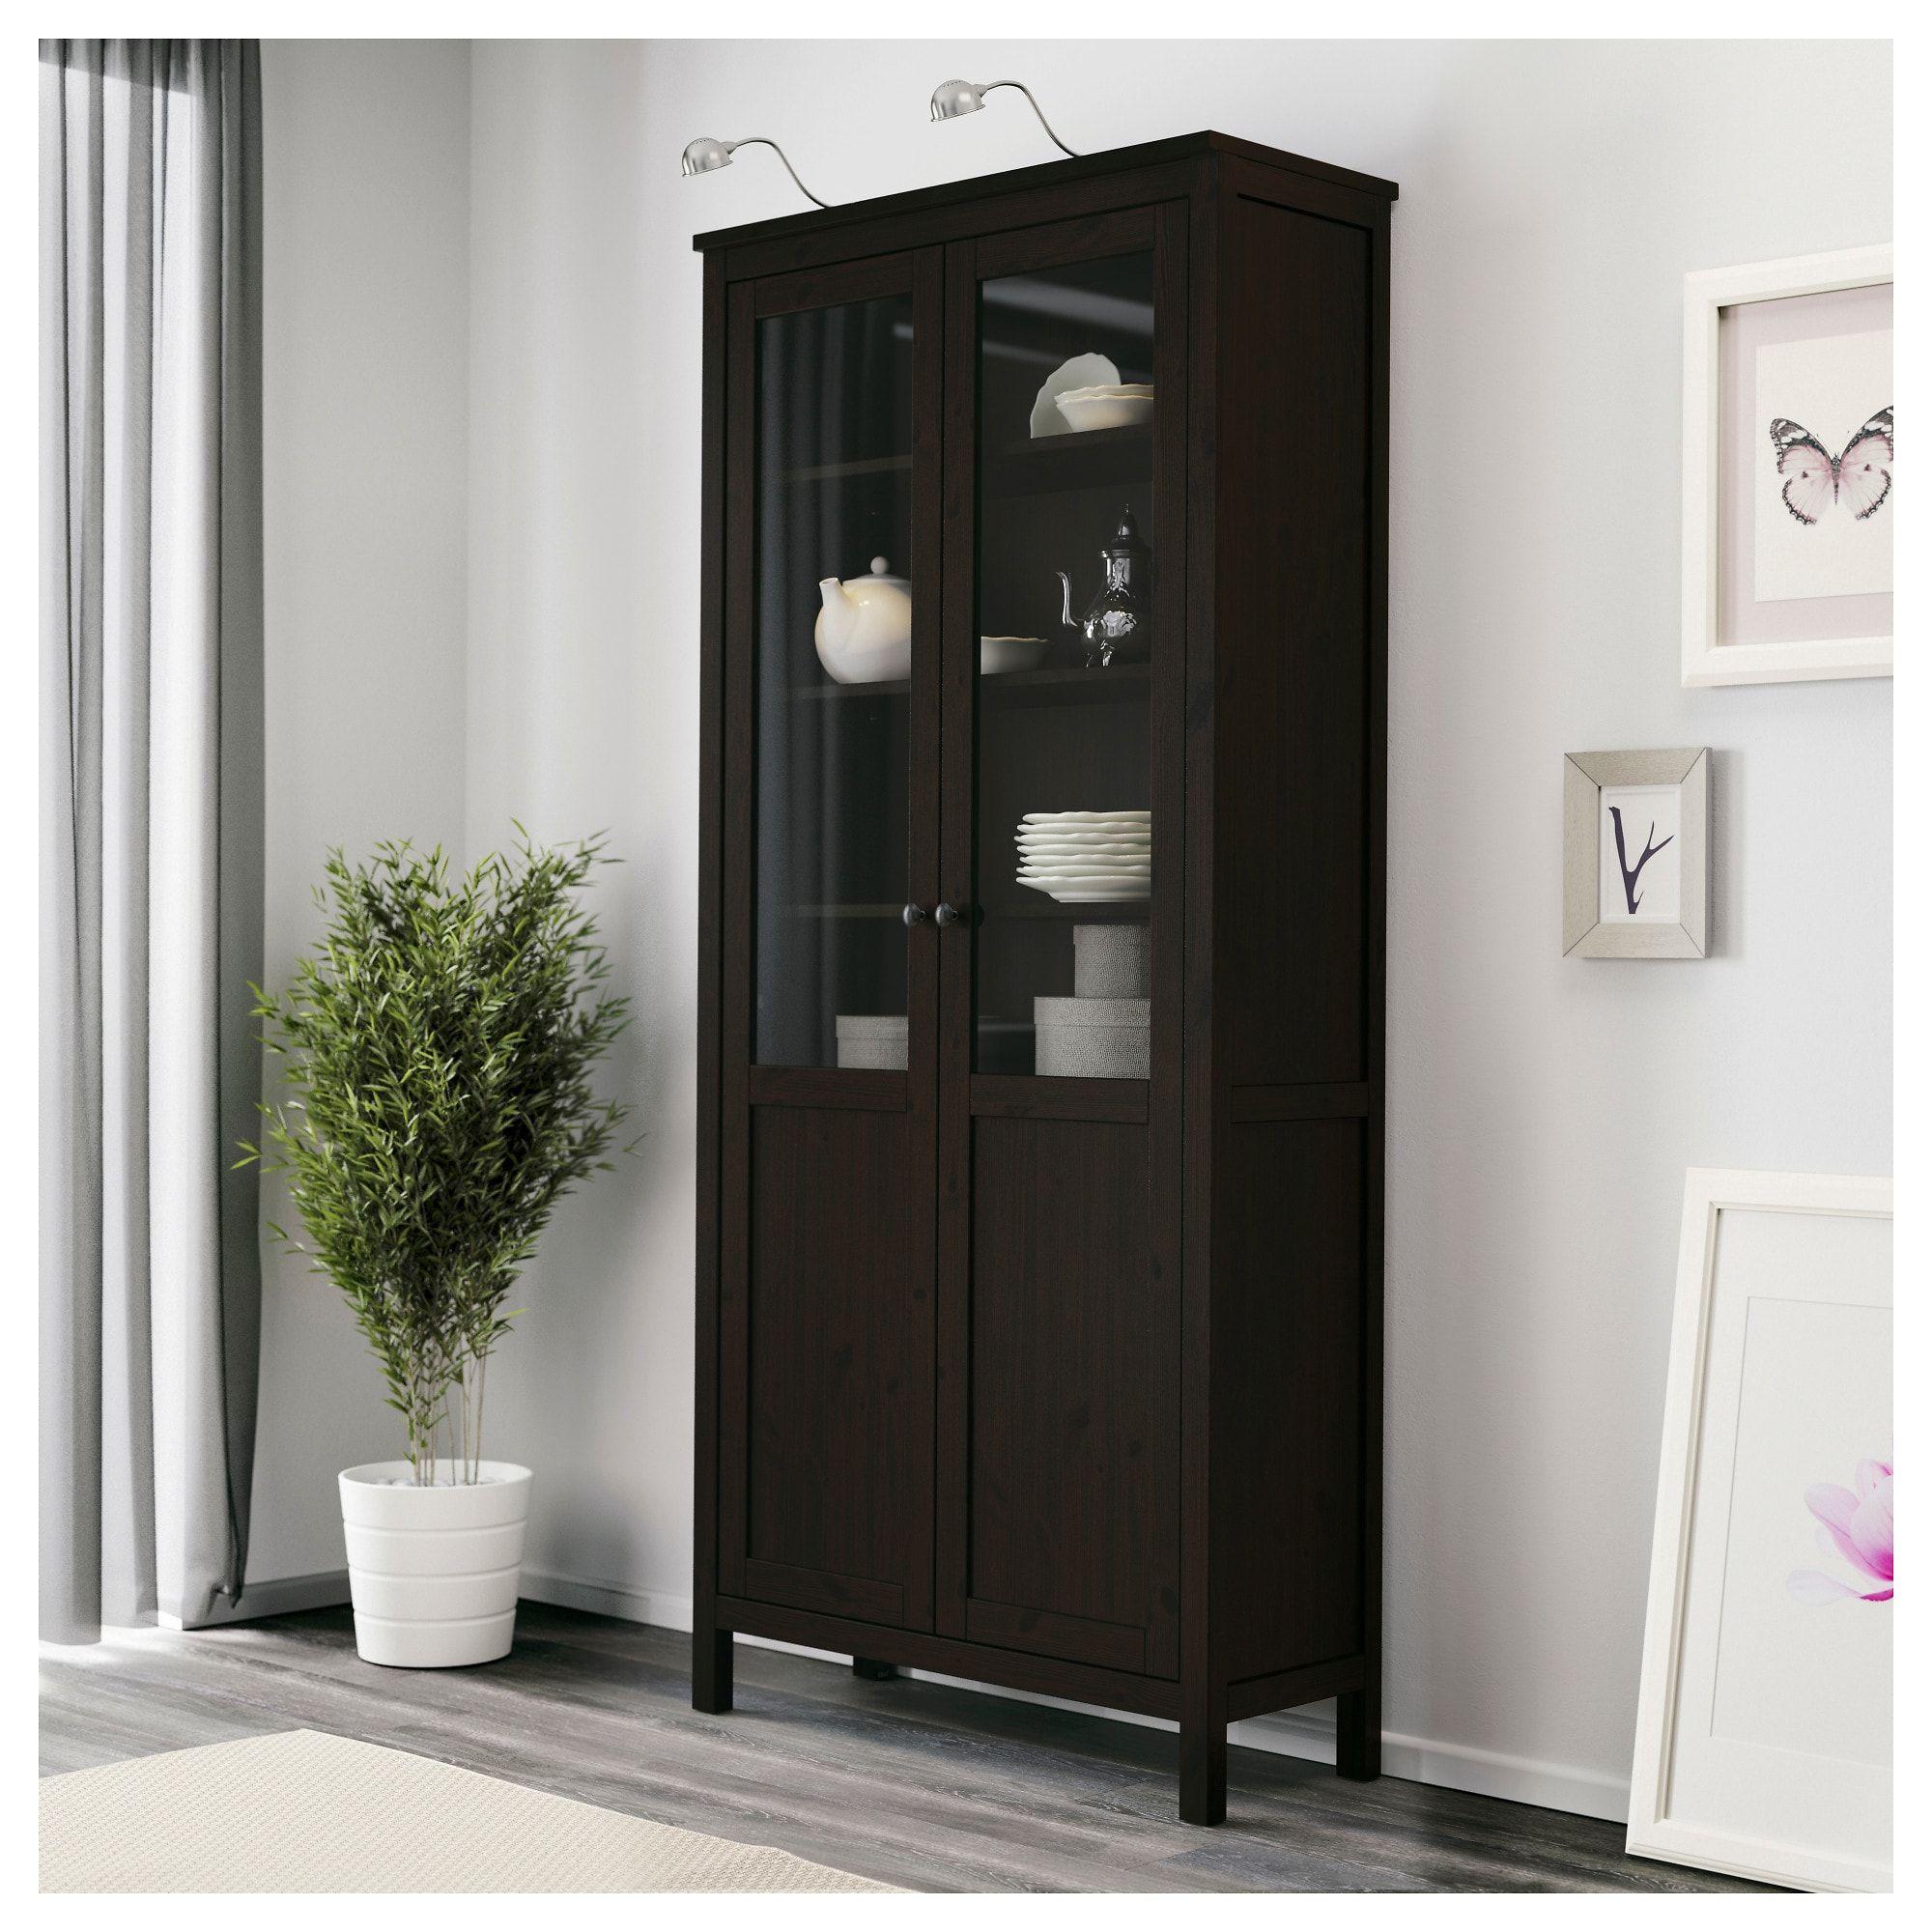 Us Furniture And Home Furnishings Glass Cabinet Doors Hemnes Glass Shelves Ikea